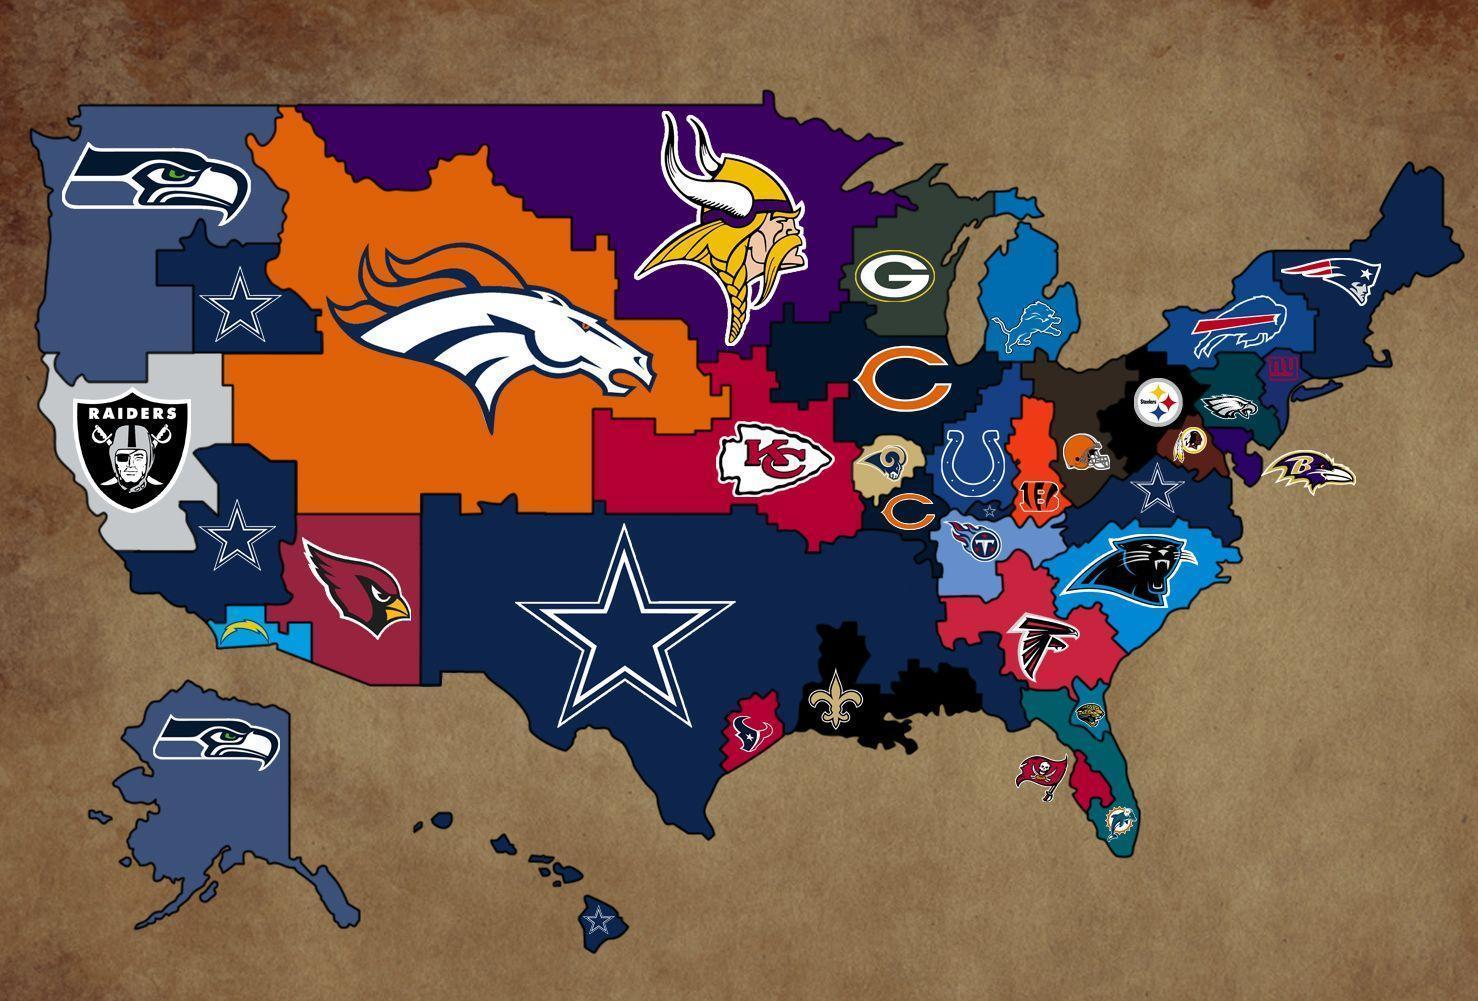 NFL Wallpaper - Best HD Wallpaper